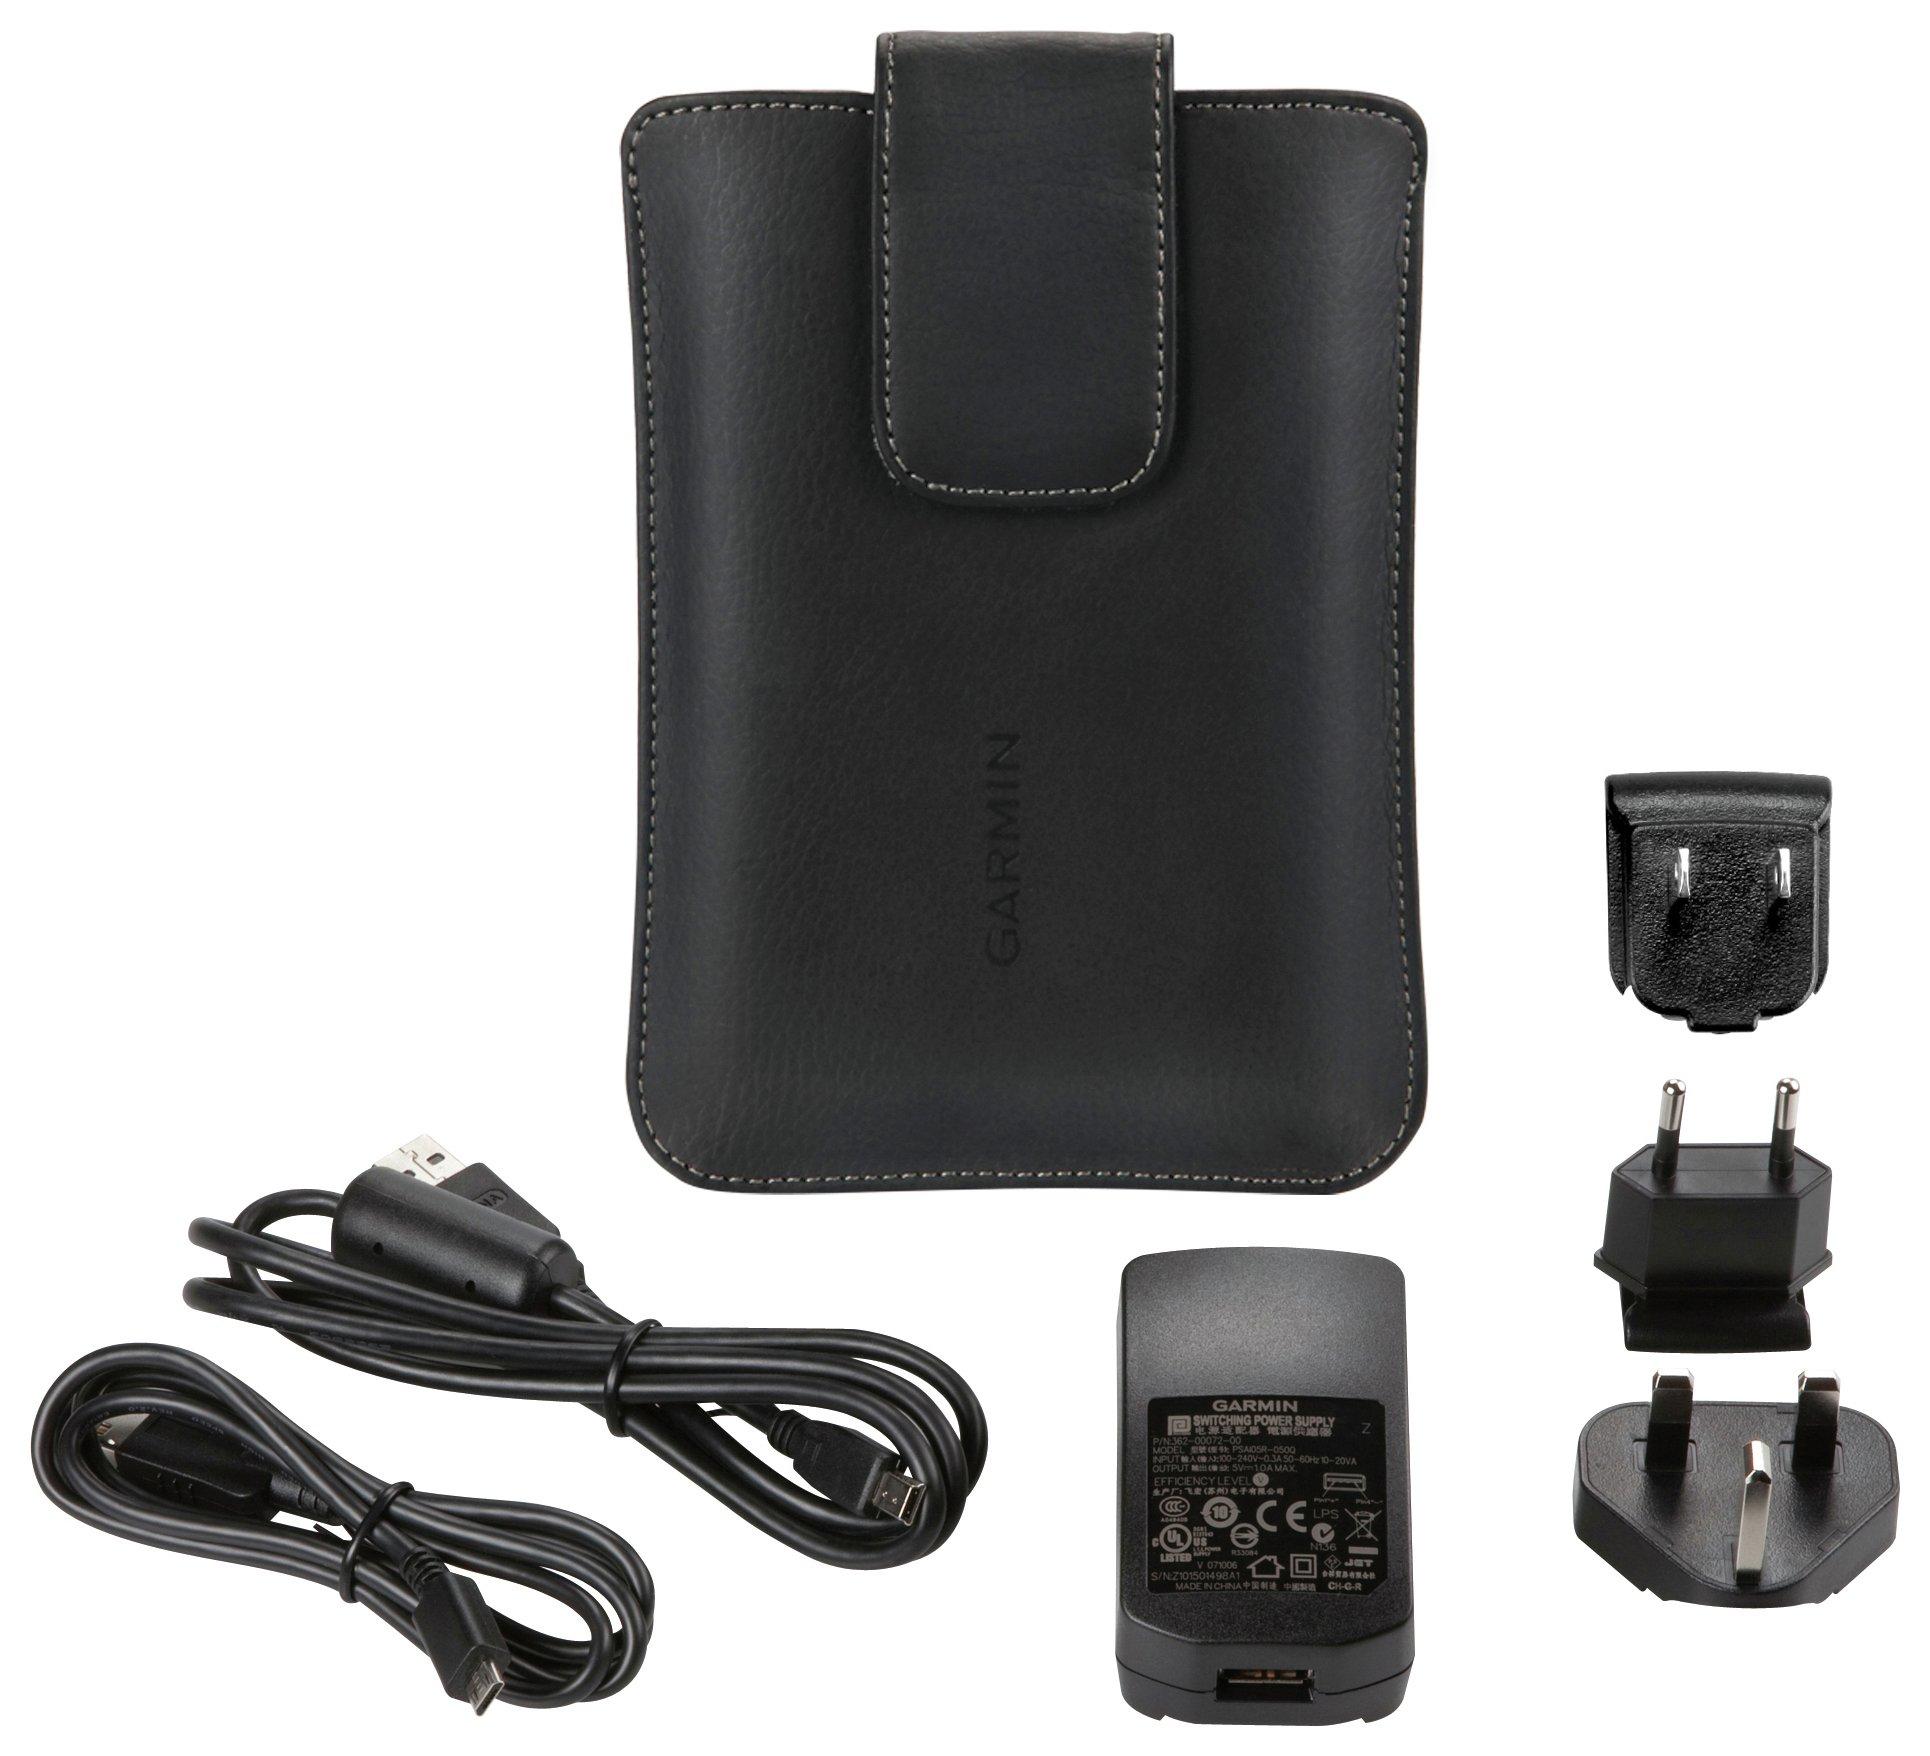 Image of Garmin - 5 or 6 Inch Sat Nav - Travel Kit